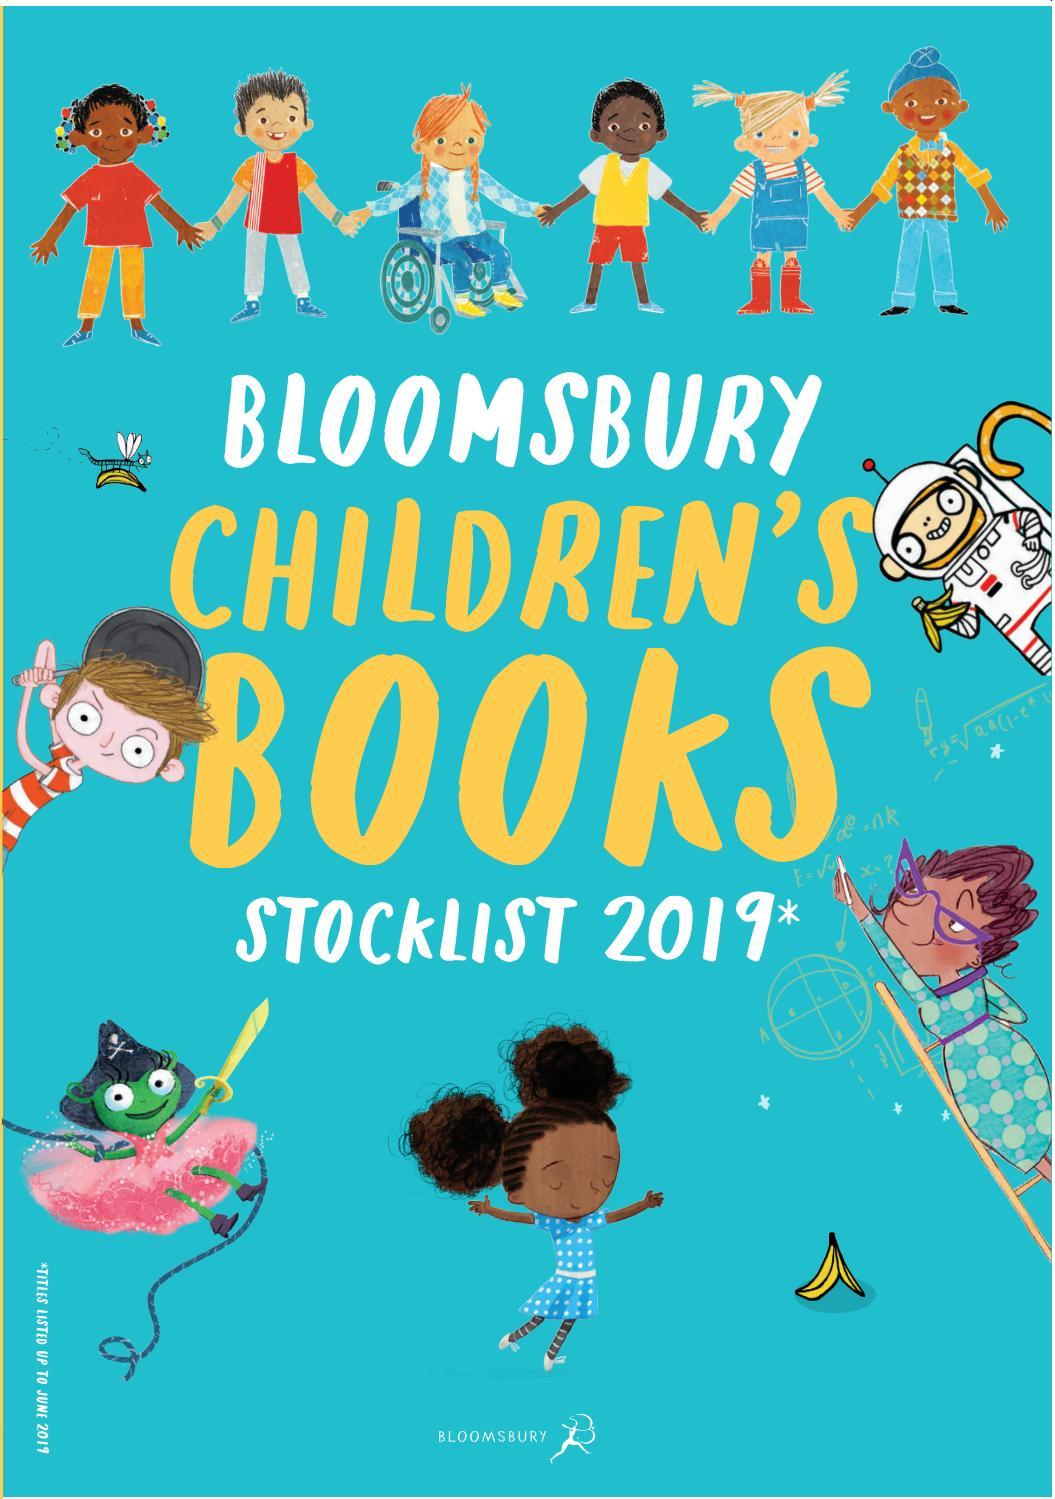 c4bb0b253 Bloomsbury Children's Stocklist 2019 by Bloomsbury Publishing - issuu